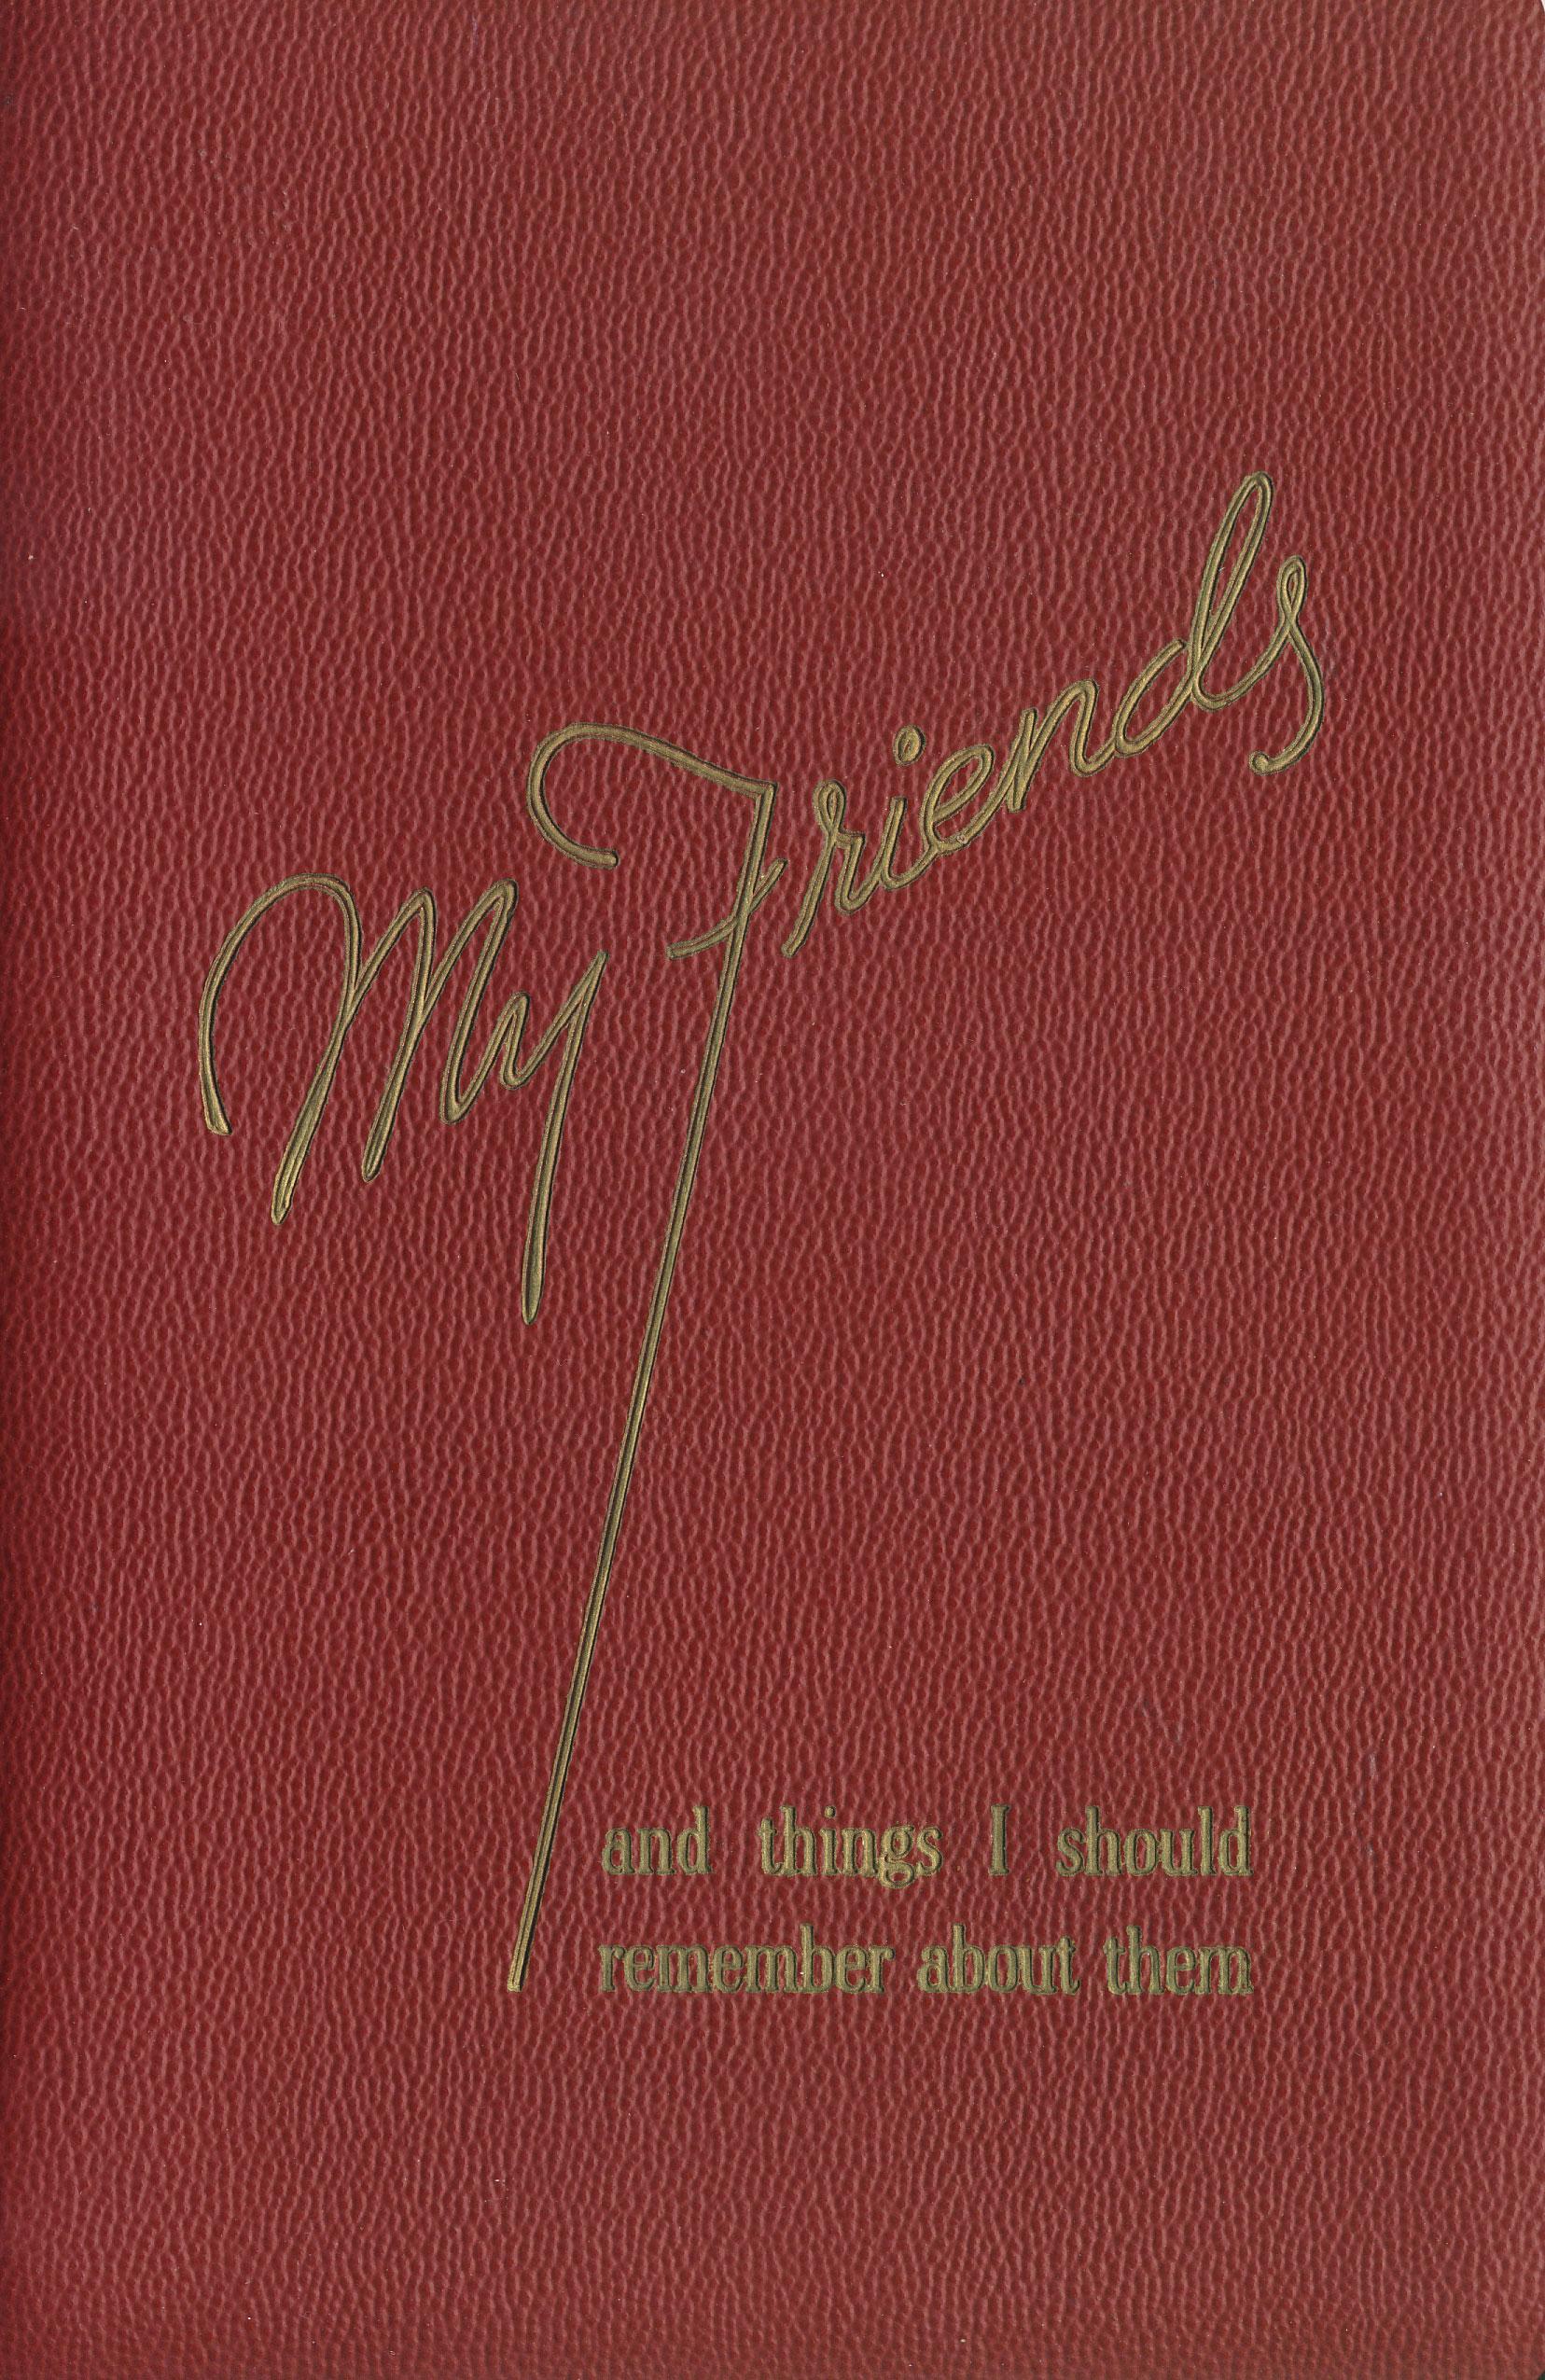 my_friends-01